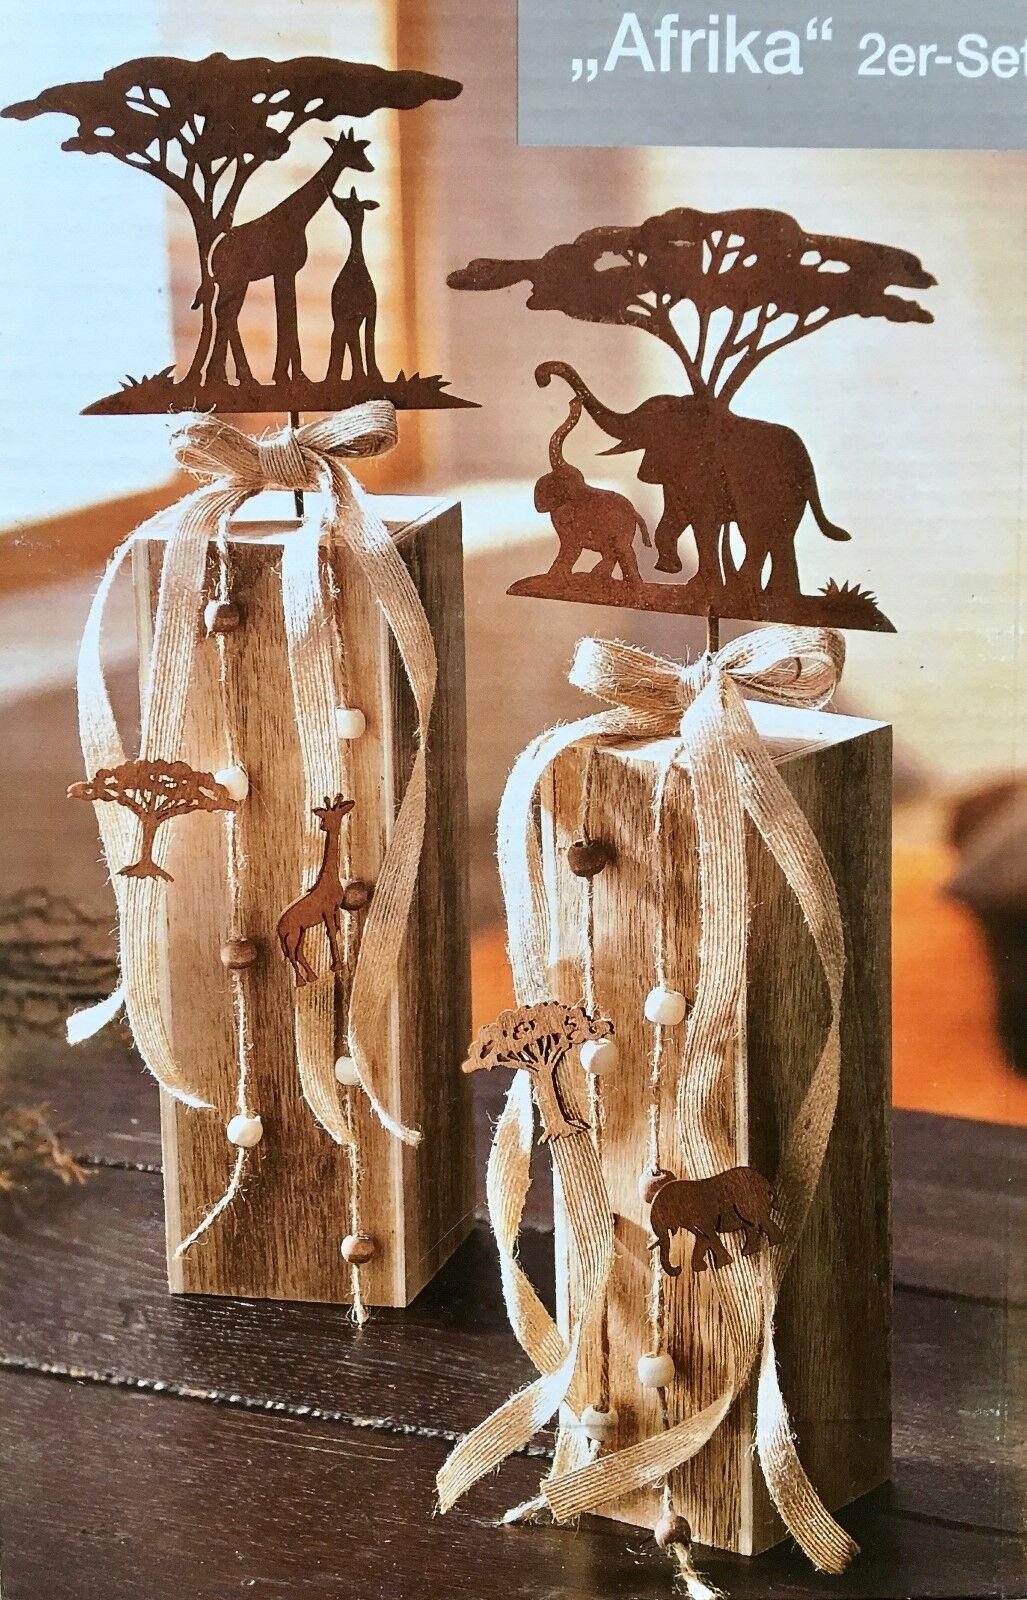 2 Dekosäulen Afrika NEU mit Elefant + Giraffe Metall und Holz